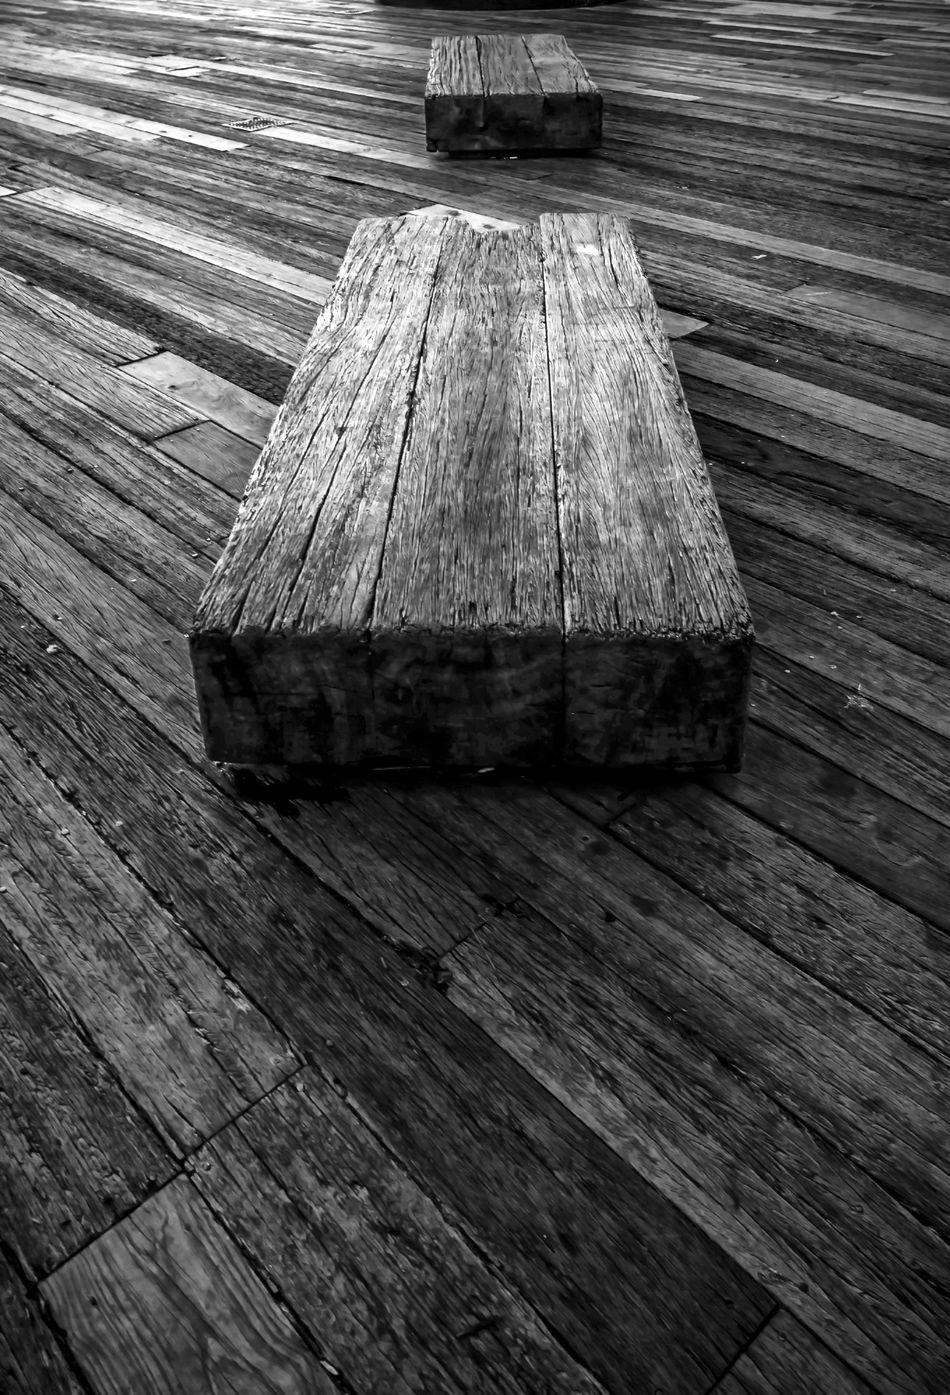 Boardwalk and Benches Minimalism_bw Minimalism Minimalist Blackandwhite Black And White Photography Black & White Black And White TexturesAndPatterns Pattern, Texture, Shape And Form Patterns Modern Modernism